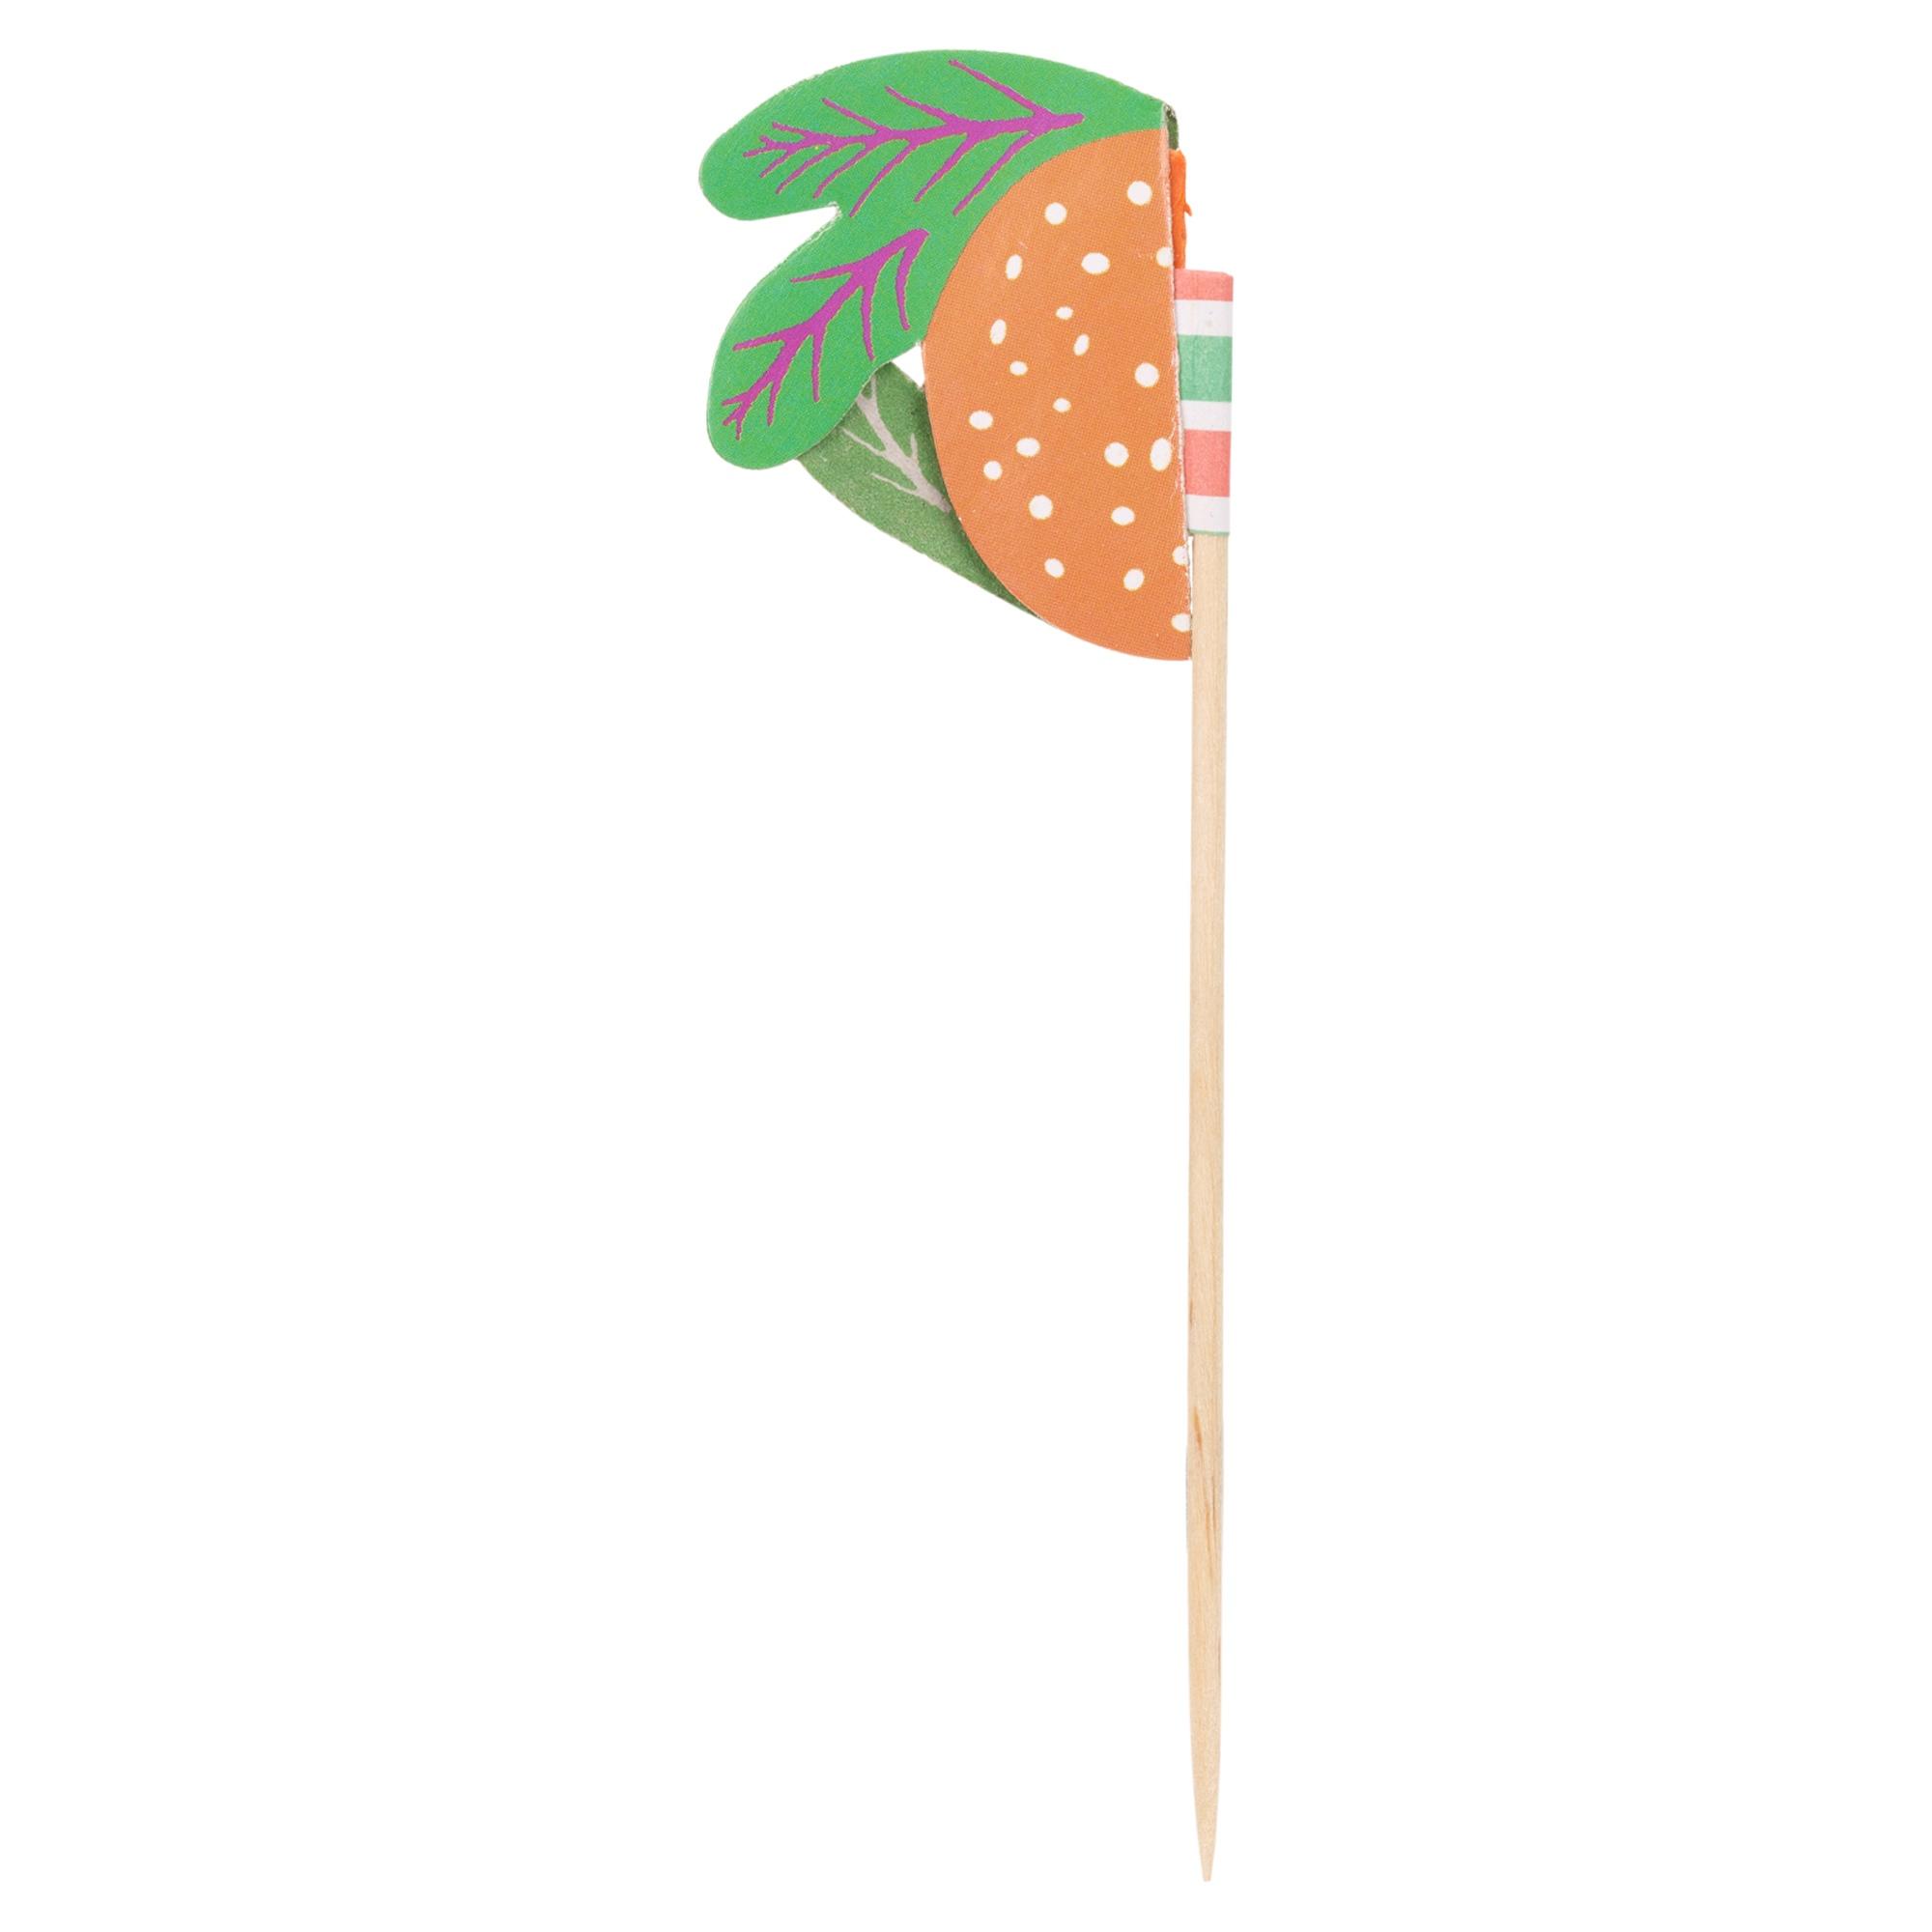 Paper Fruit Cocktail Picks Drinks Snack Skewers Party